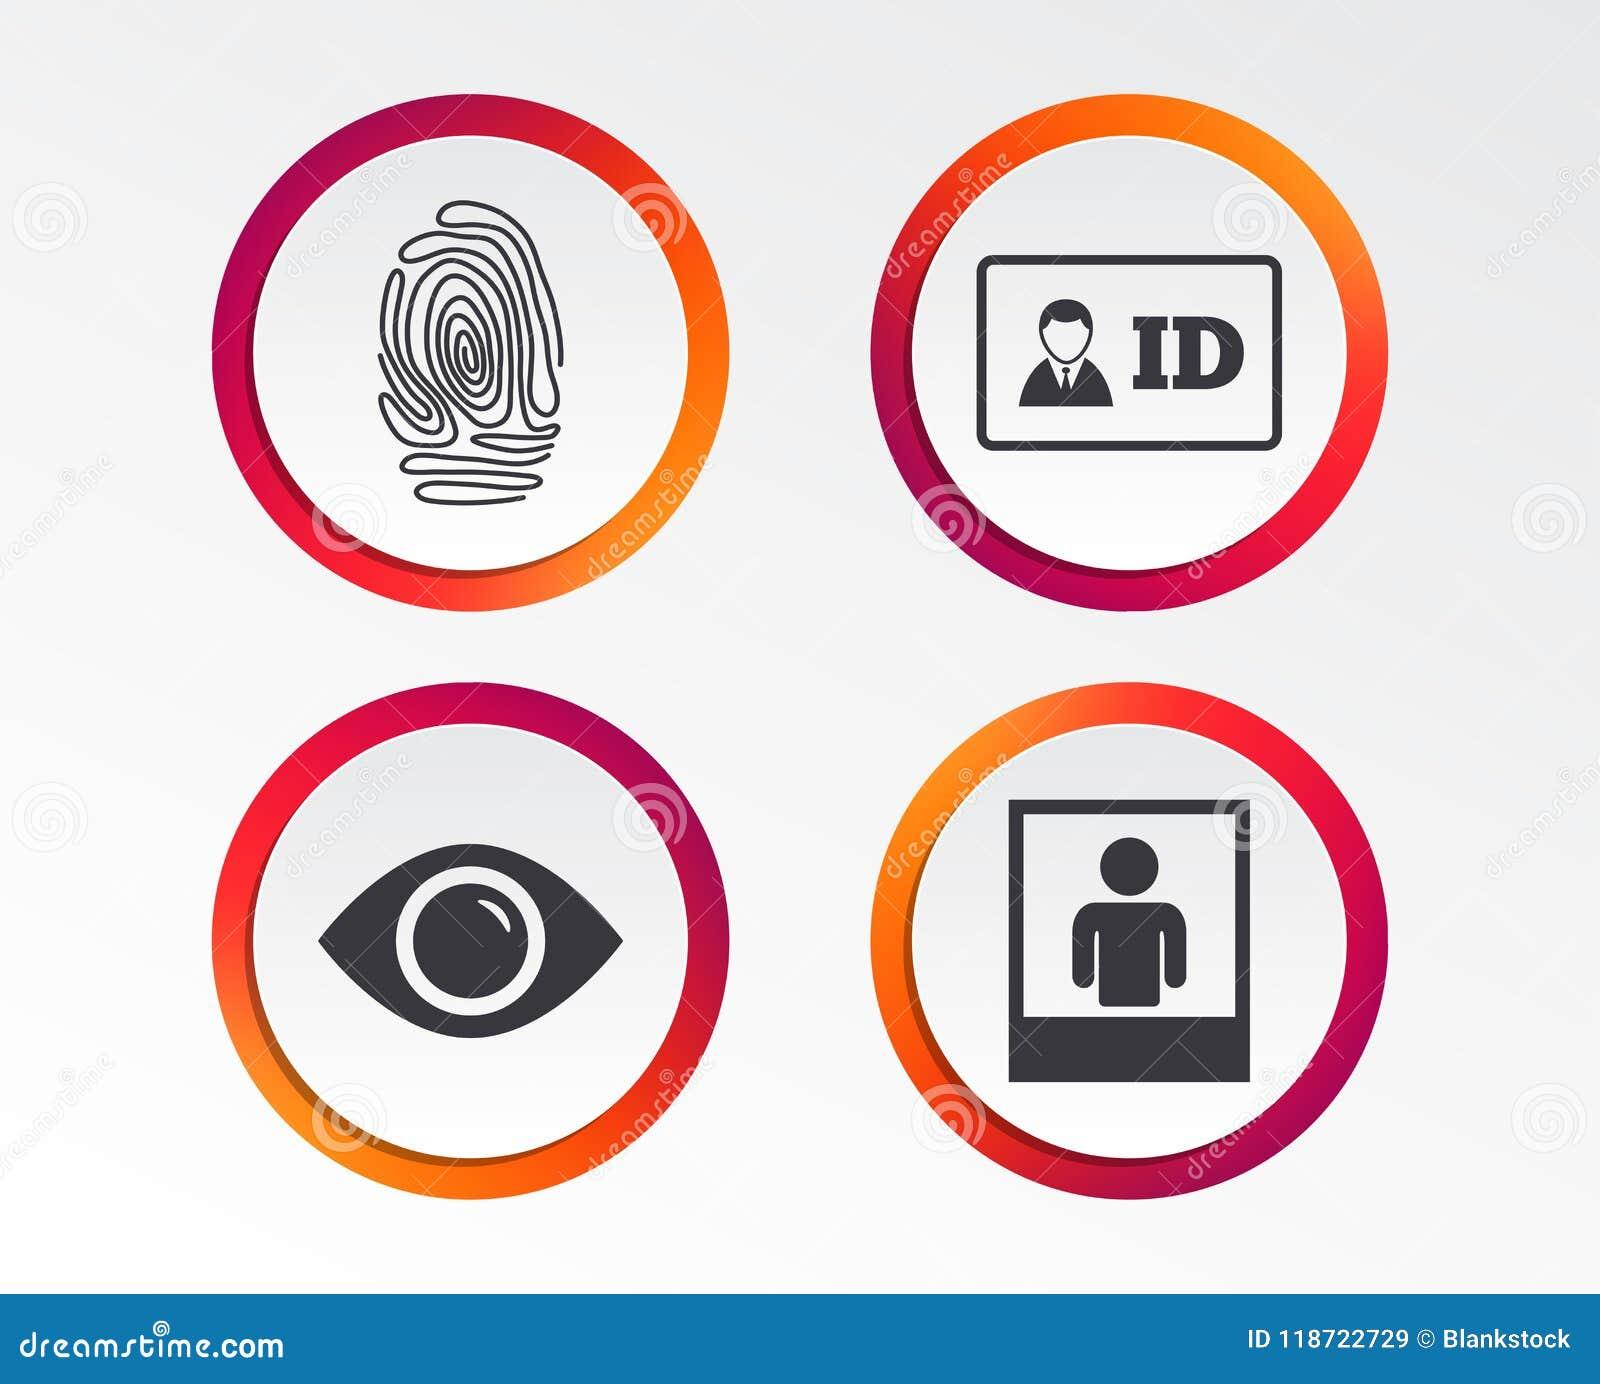 Identity Id Card Badge Icons Eye Symbol Stock Vector